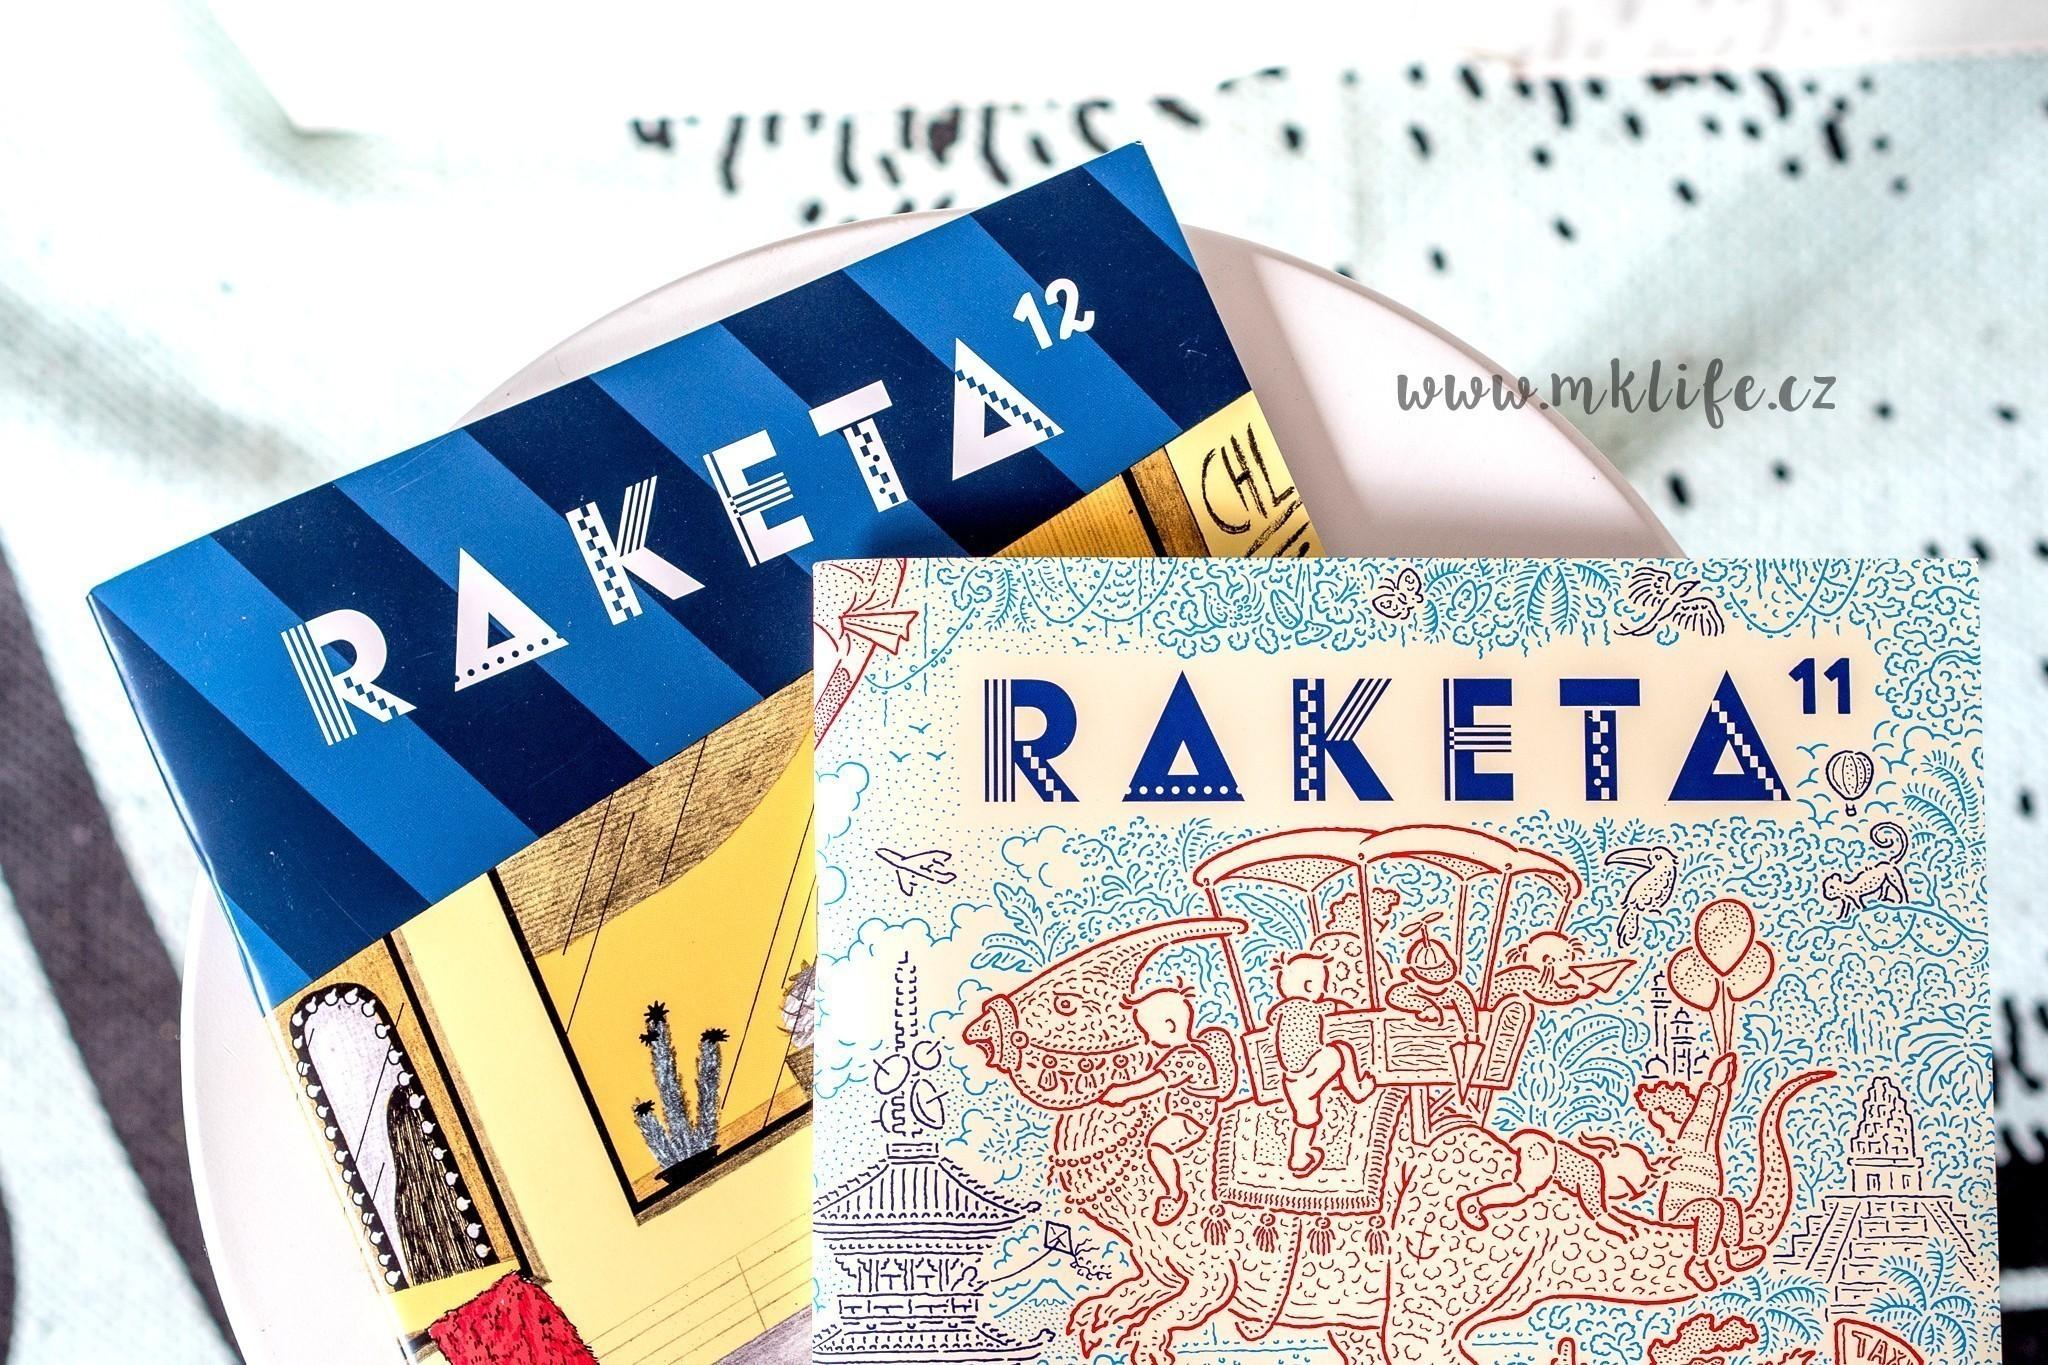 9a0b45595 VYHRAJ zatloukačku | časopis Raketa • mklife.cz